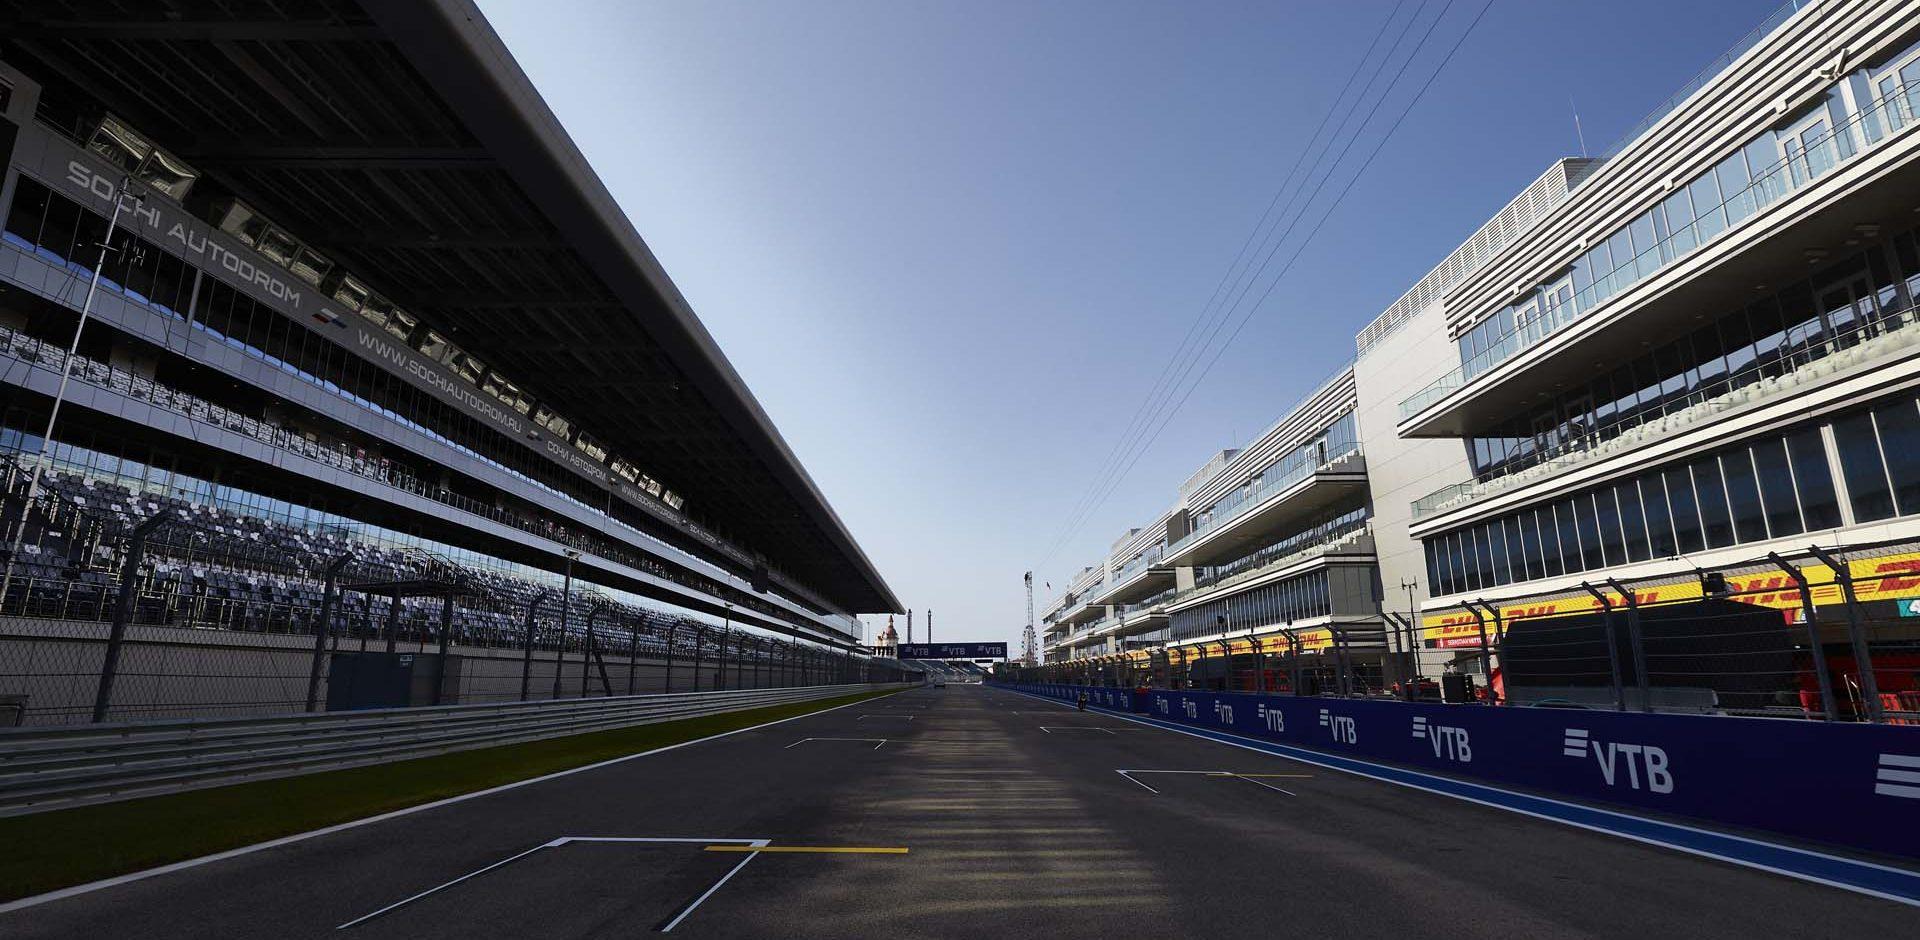 2020 Russian Grand Prix, Thursday - Steve Etherington Sochi track